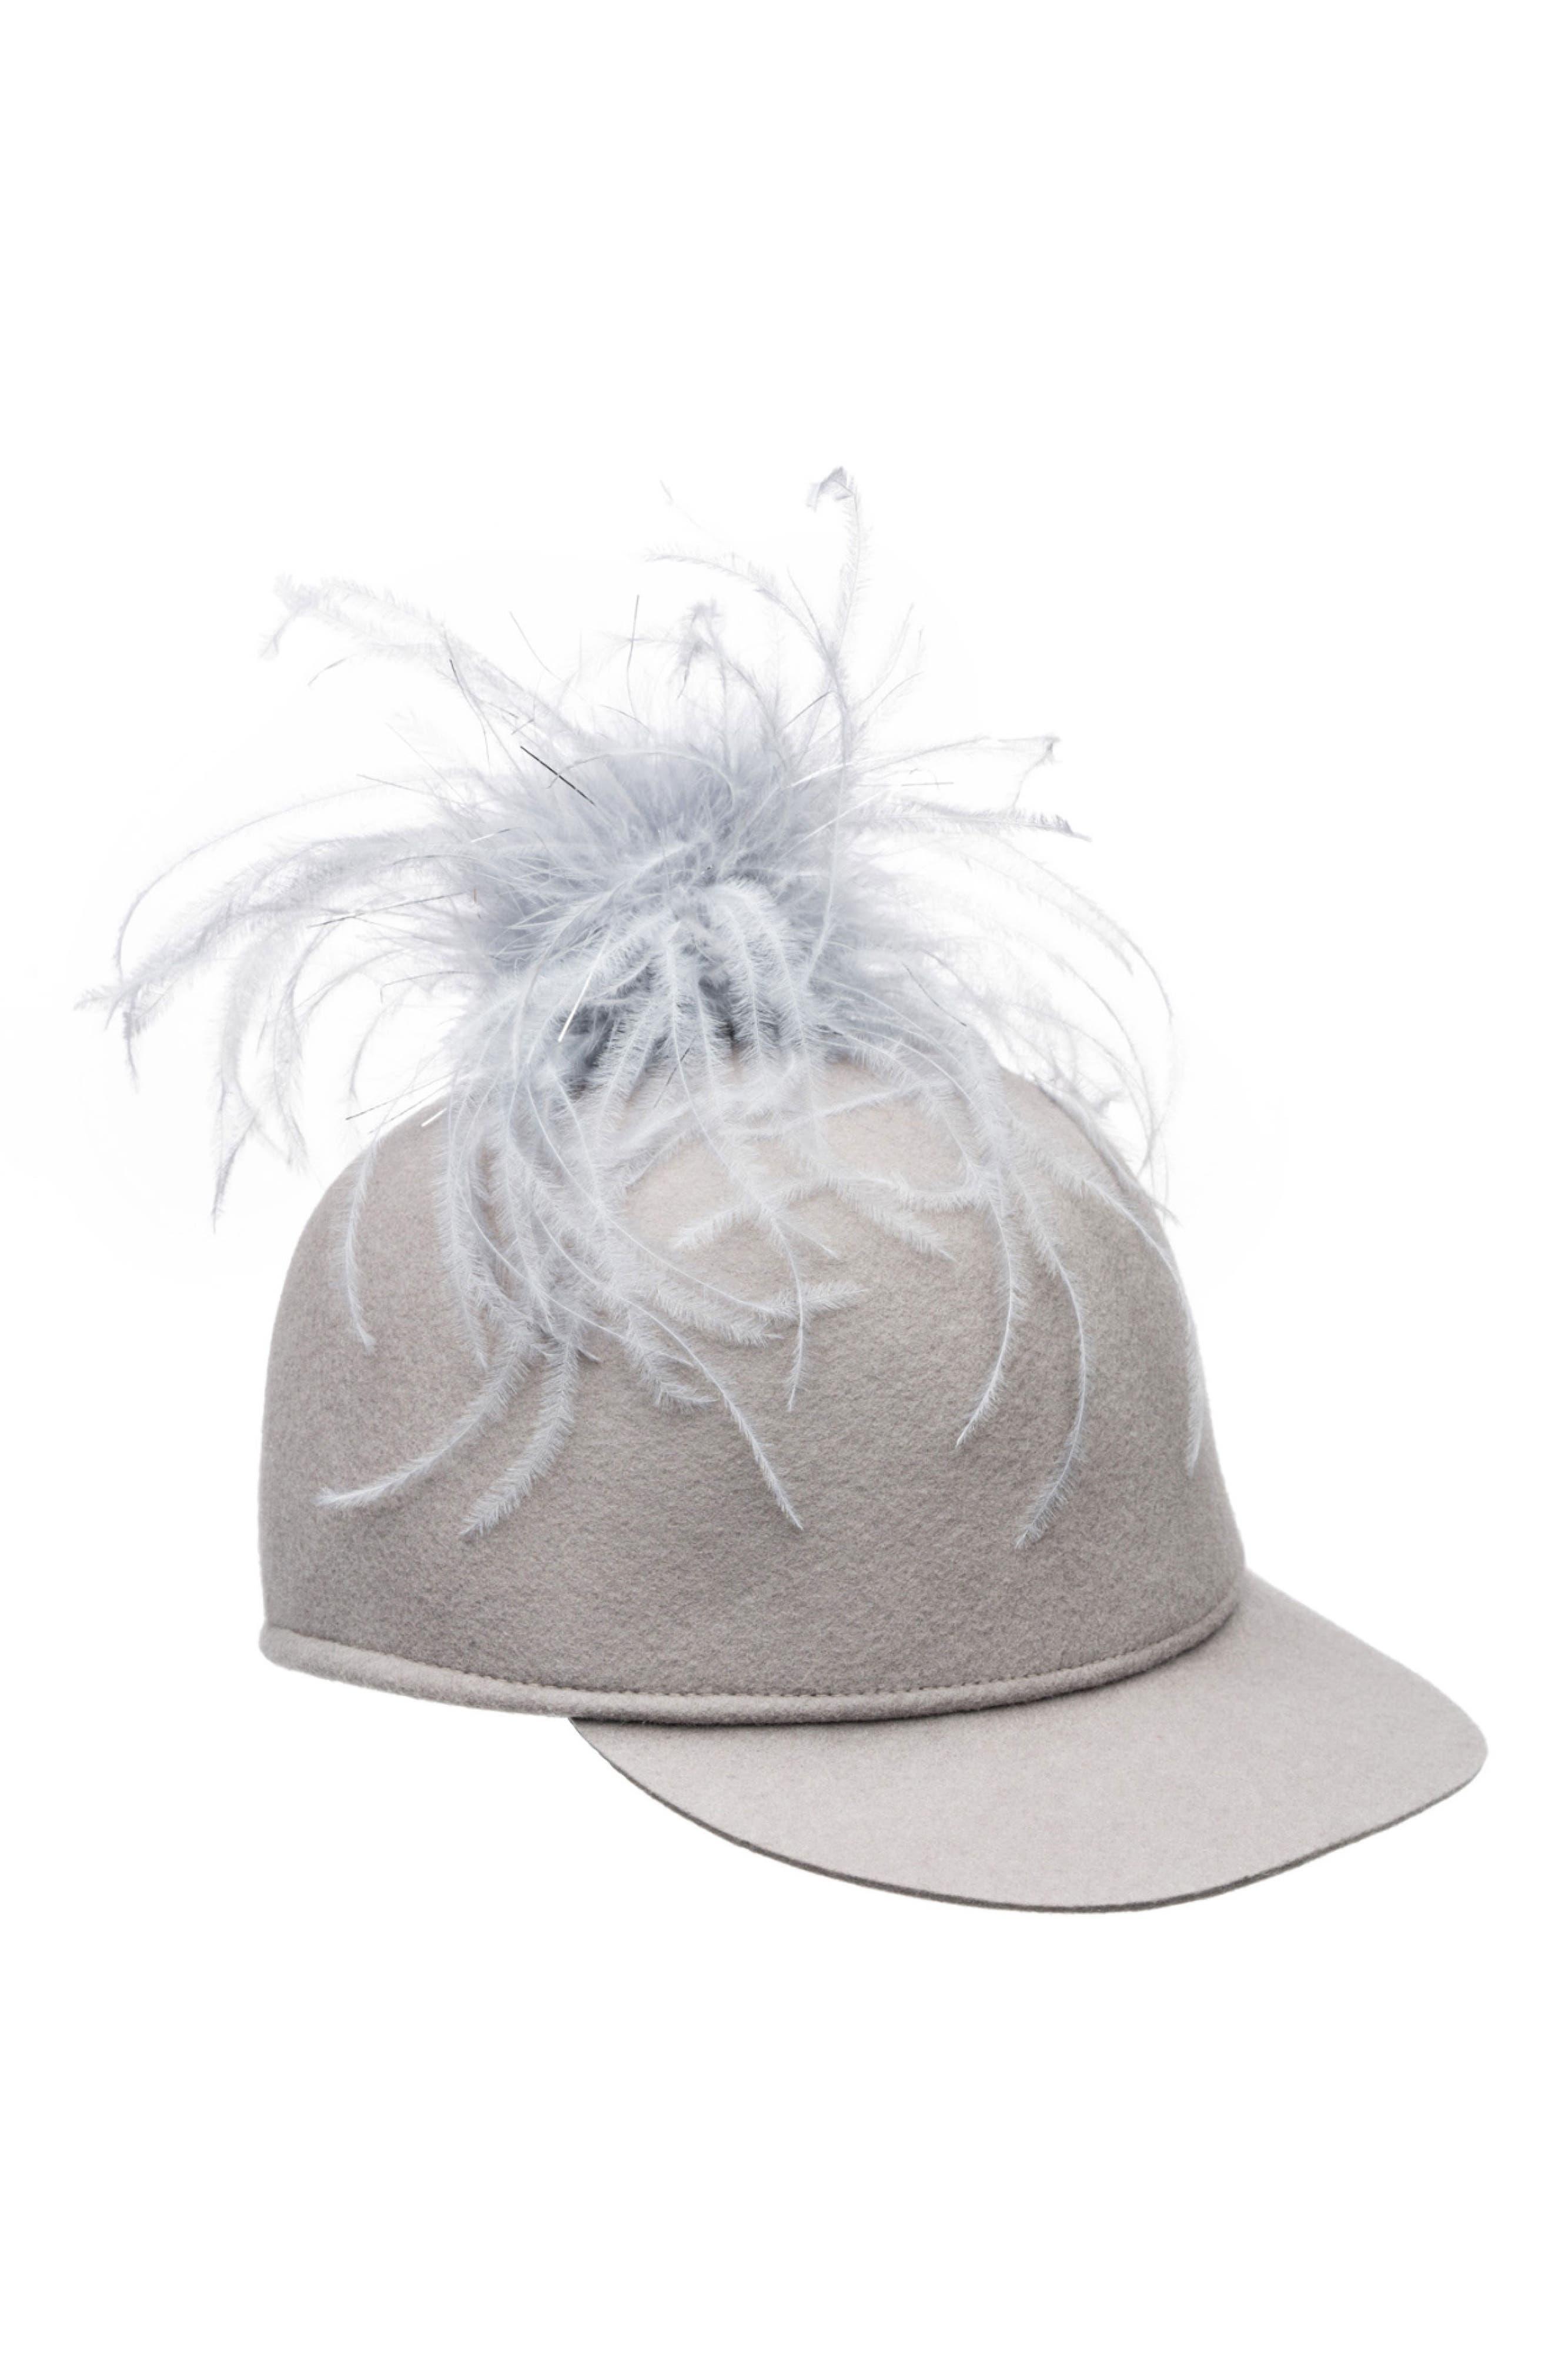 Alex Ostrich Feather Pom Cap,                         Main,                         color, Light Grey